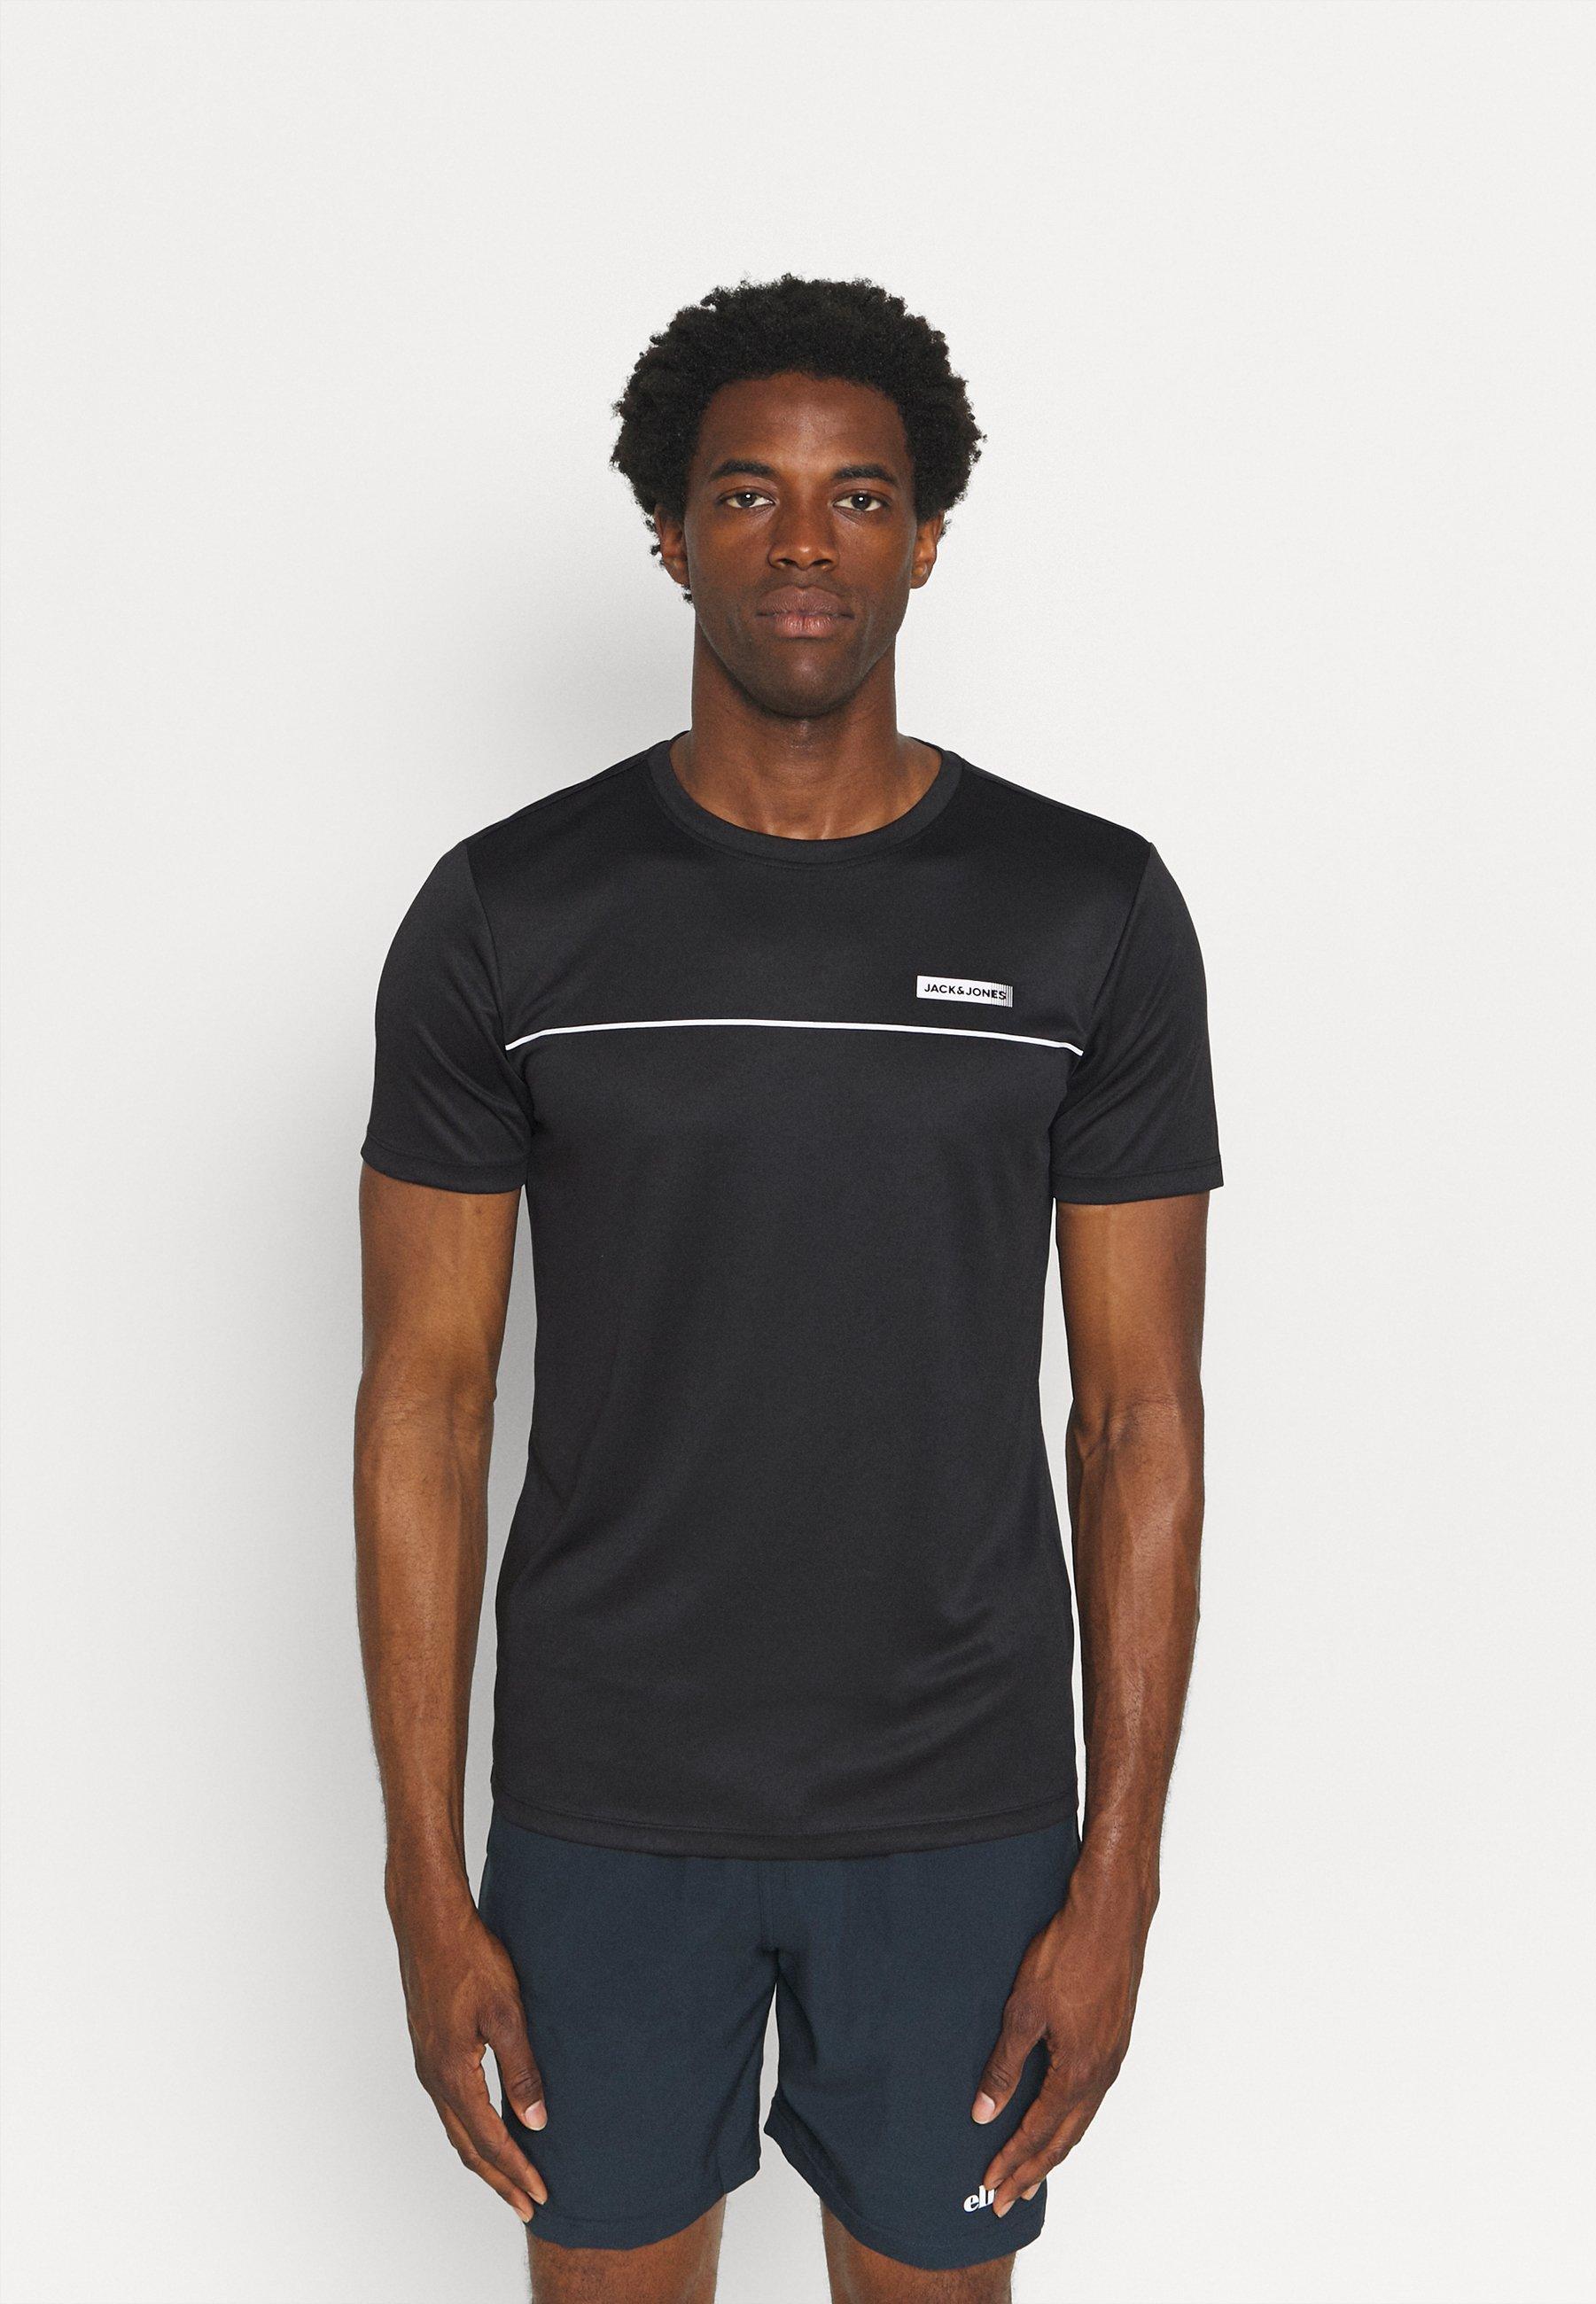 Men JCOZSS PERFORMANCE TEE 2 PACK - Print T-shirt - black/forest night